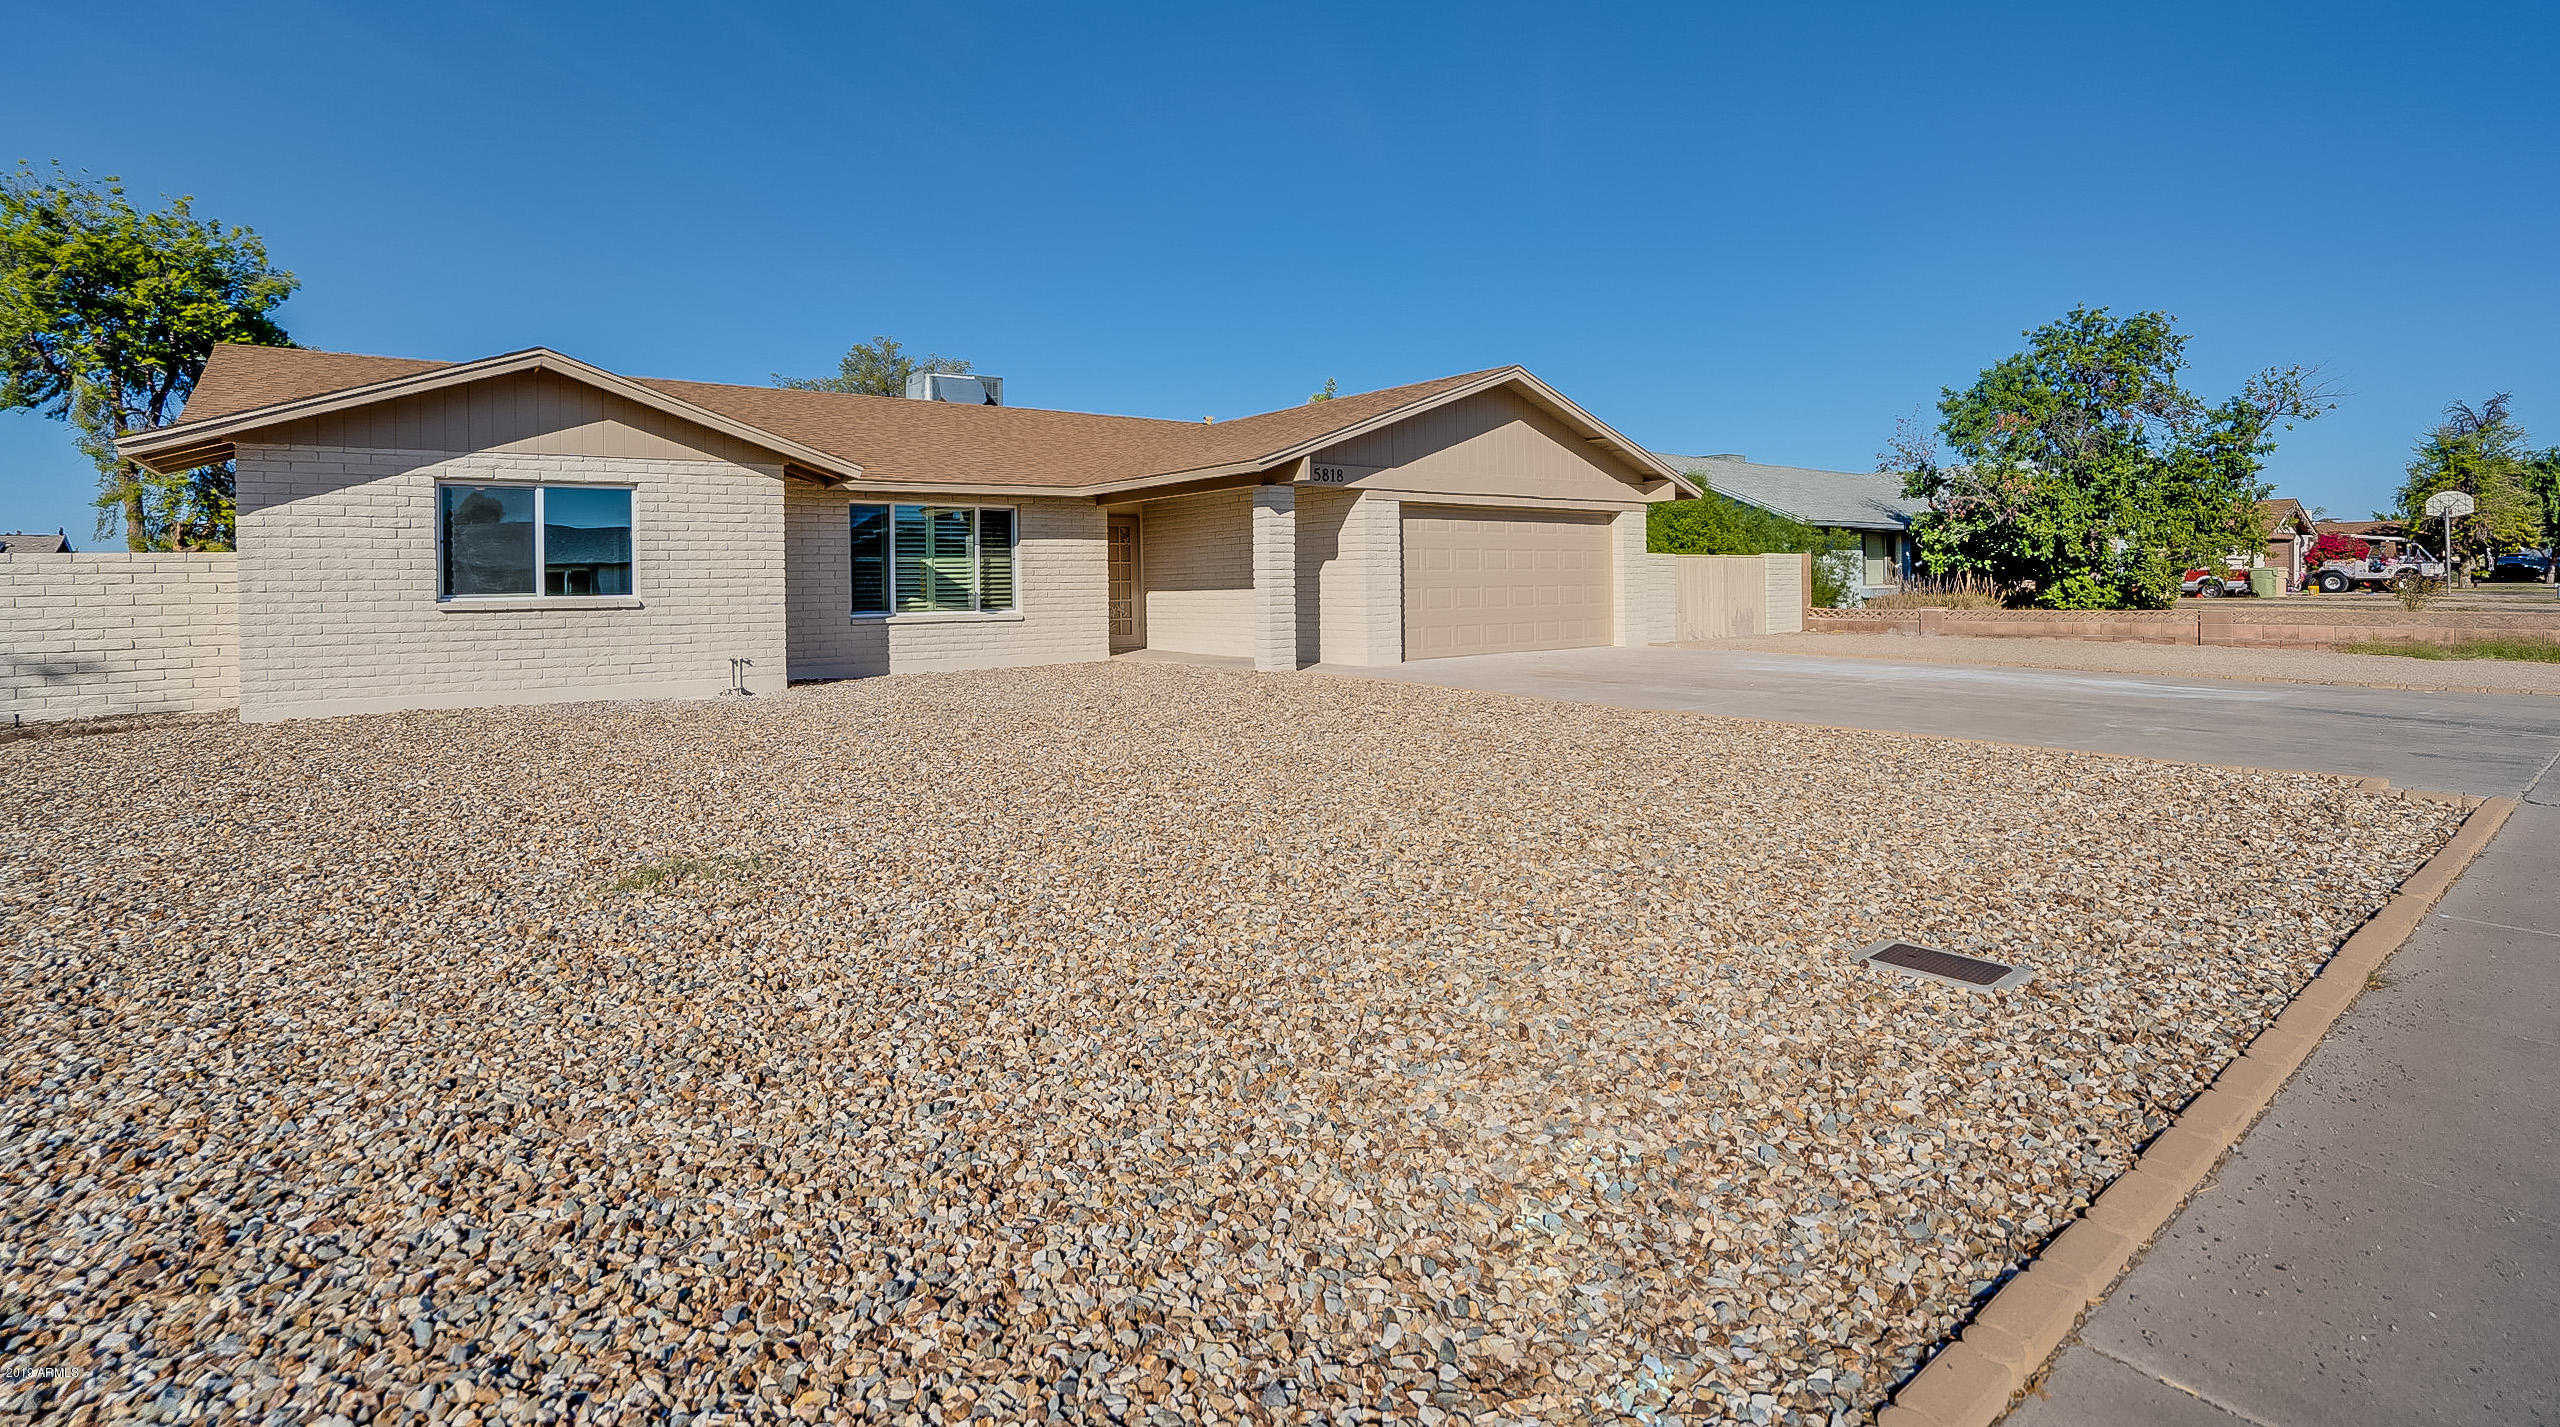 $374,900 - 4Br/2Ba - Home for Sale in Sunburst Farms 24, Glendale